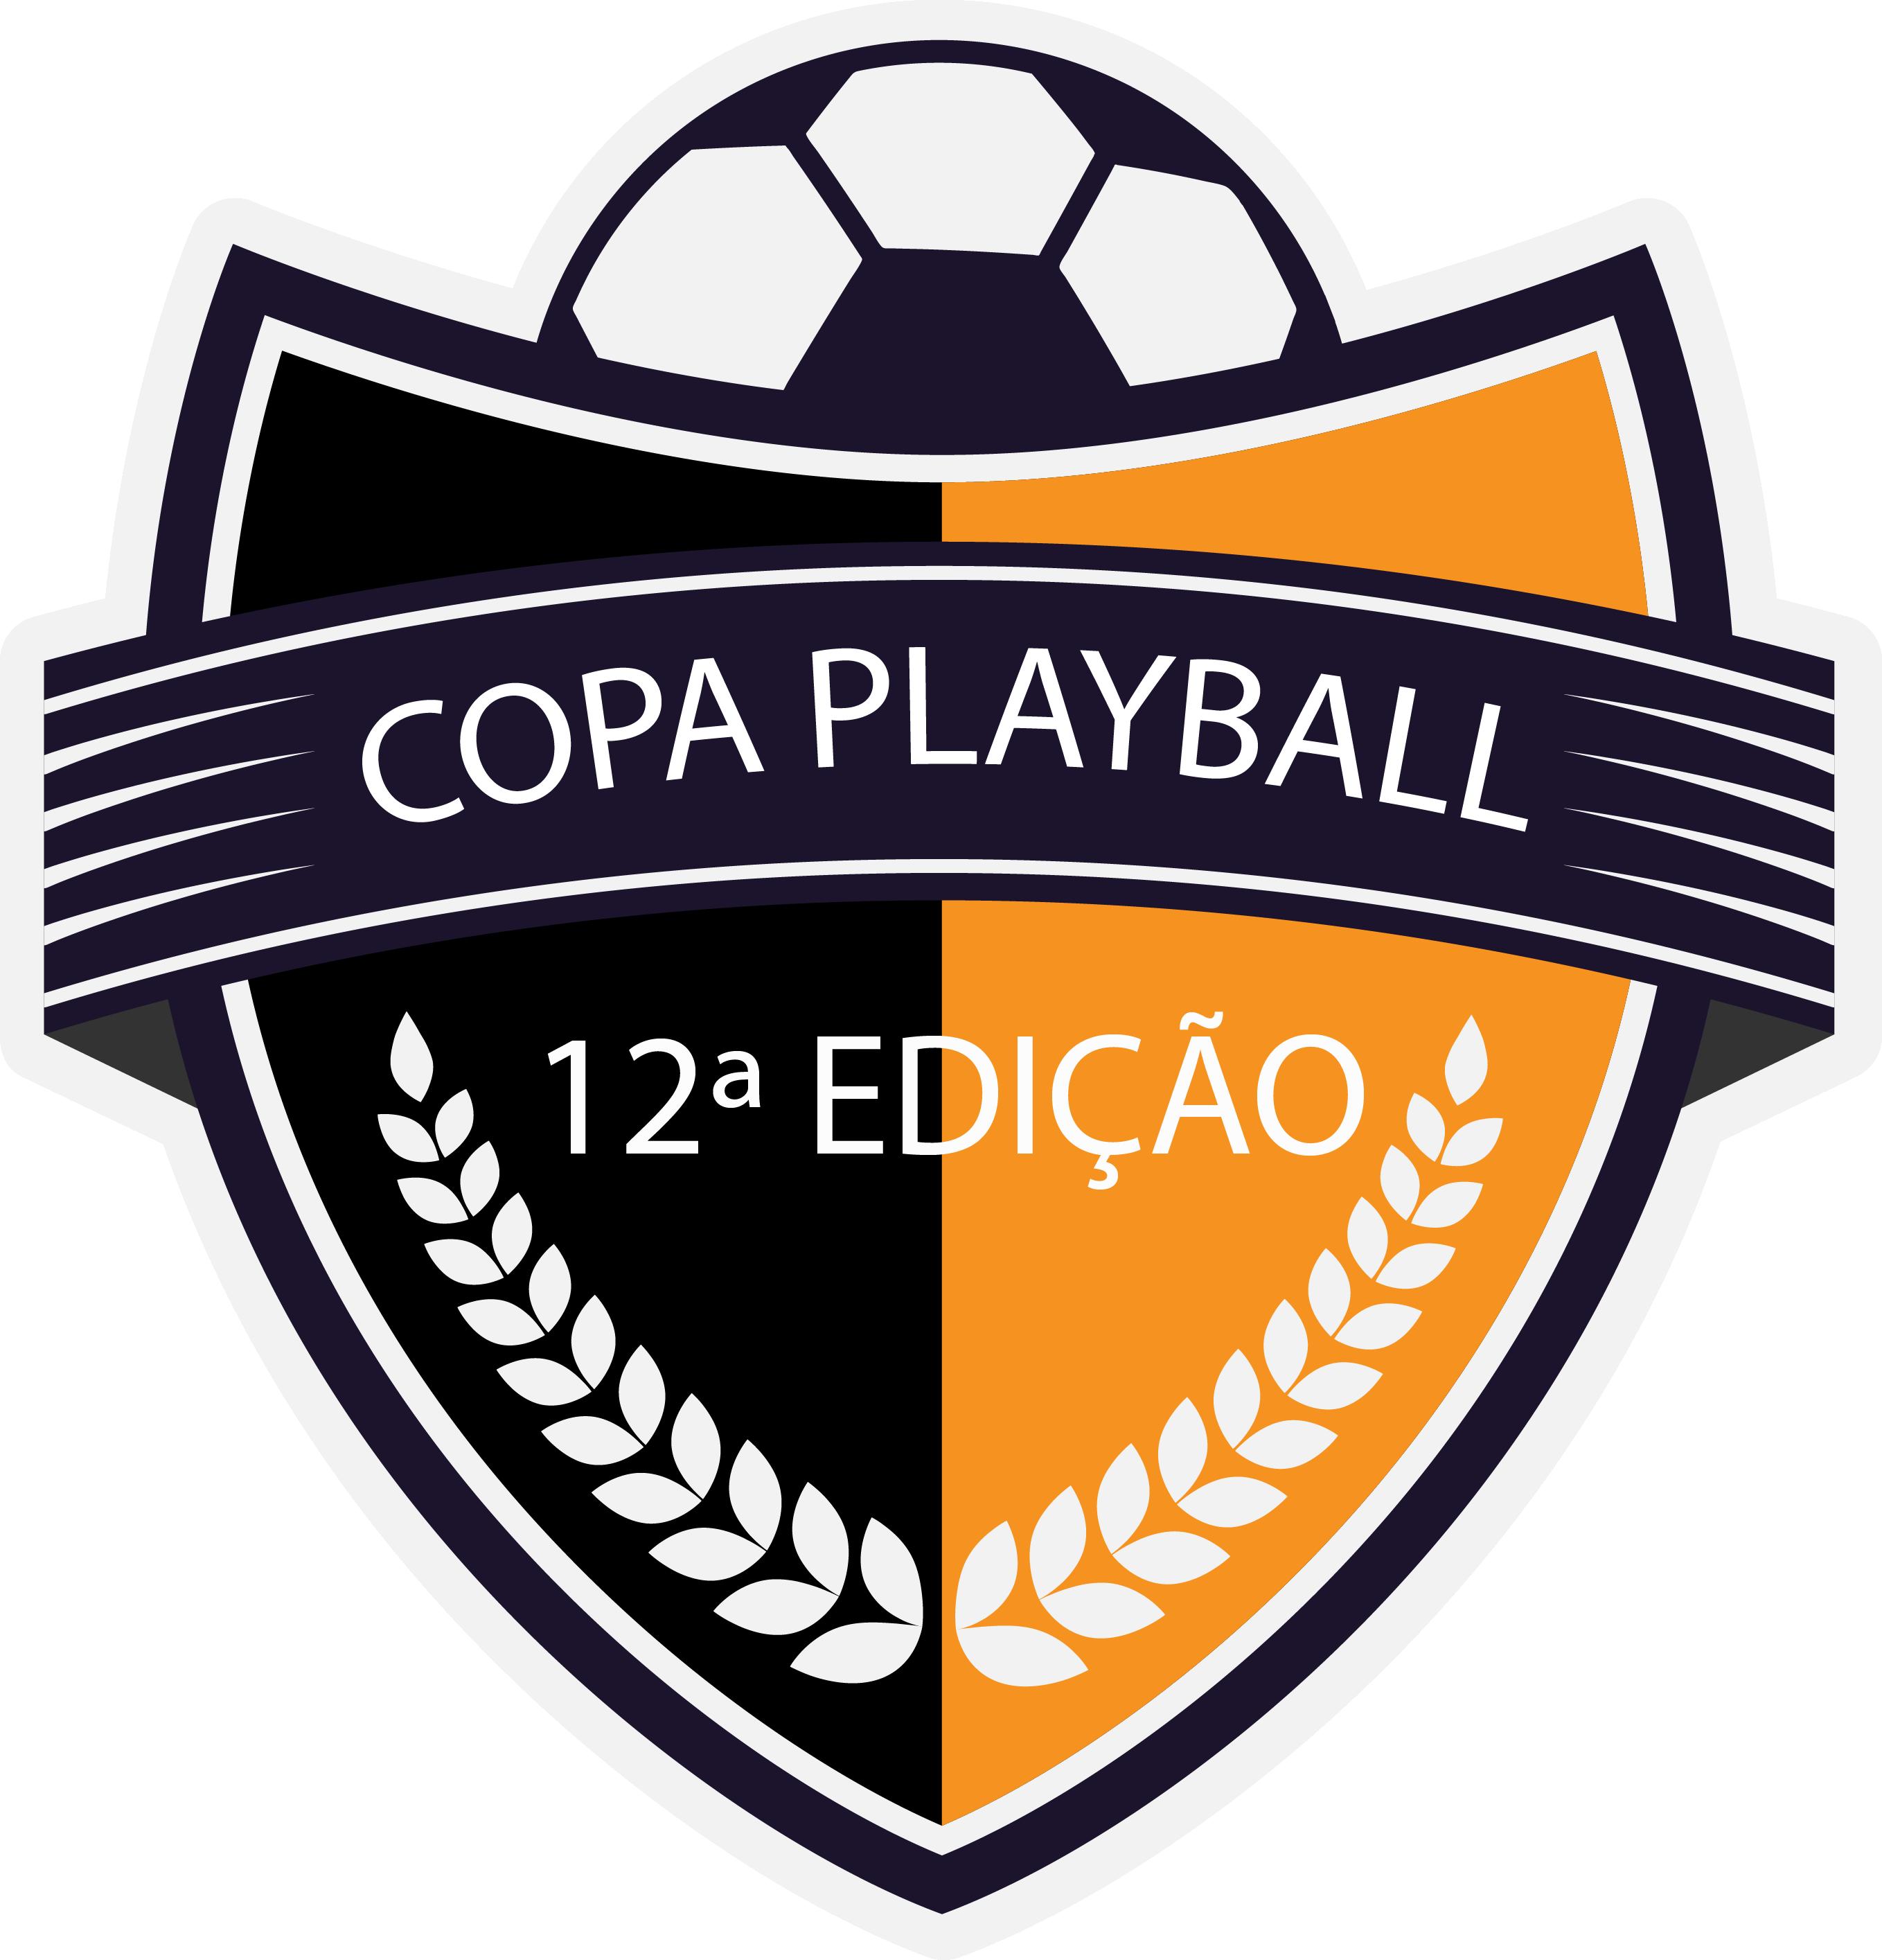 XII Copa Playball Séries A, B, C e D´acesso de Fut 7 Society